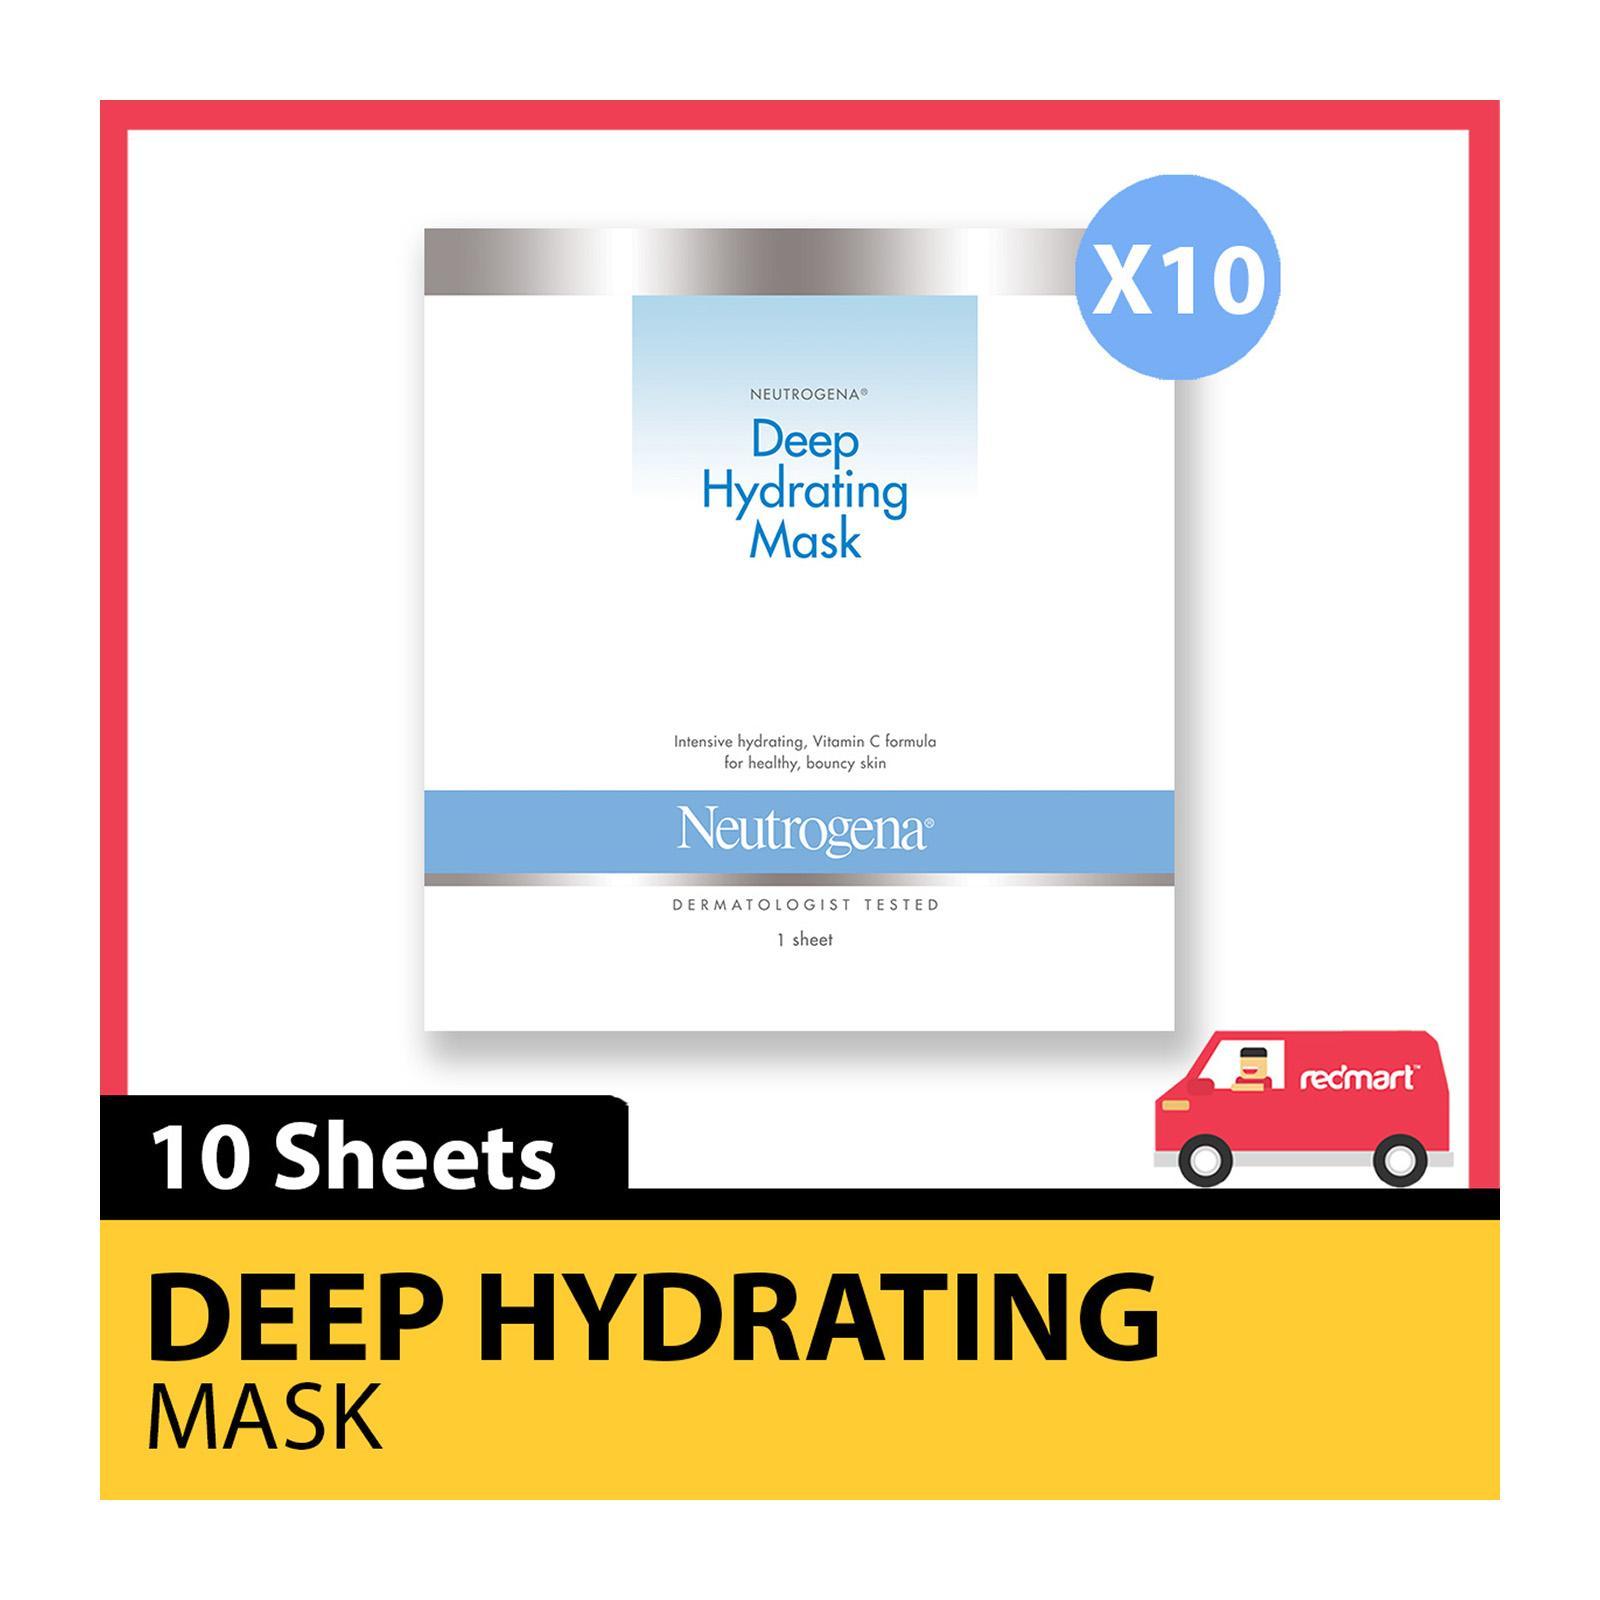 Neutrogena Deep Hydrating Mask - Bundle of 10